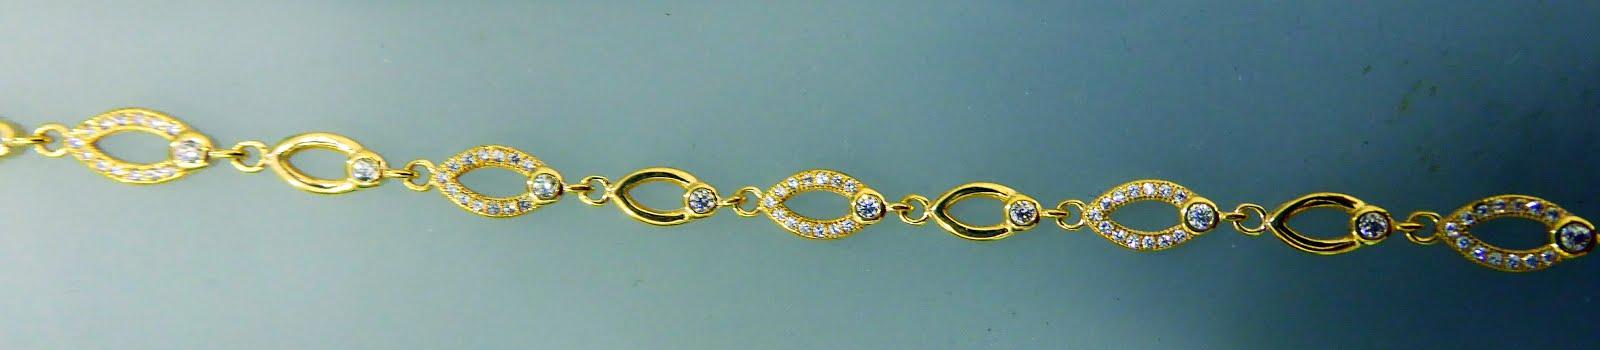 Elegante pulsera de plata dorada italiana